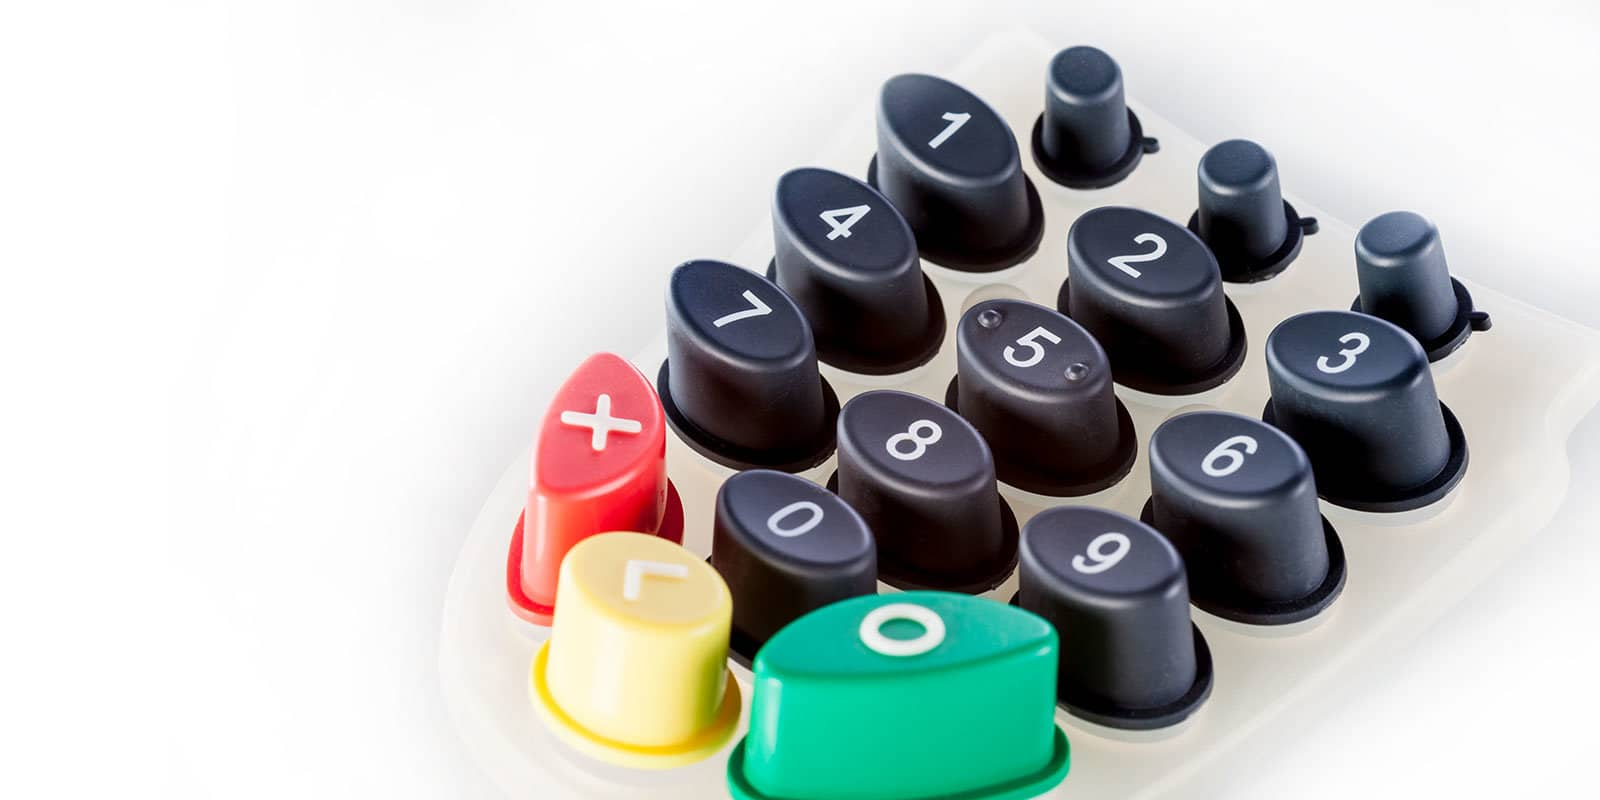 Silikonschaltmatte mehrfarbig von mentec®